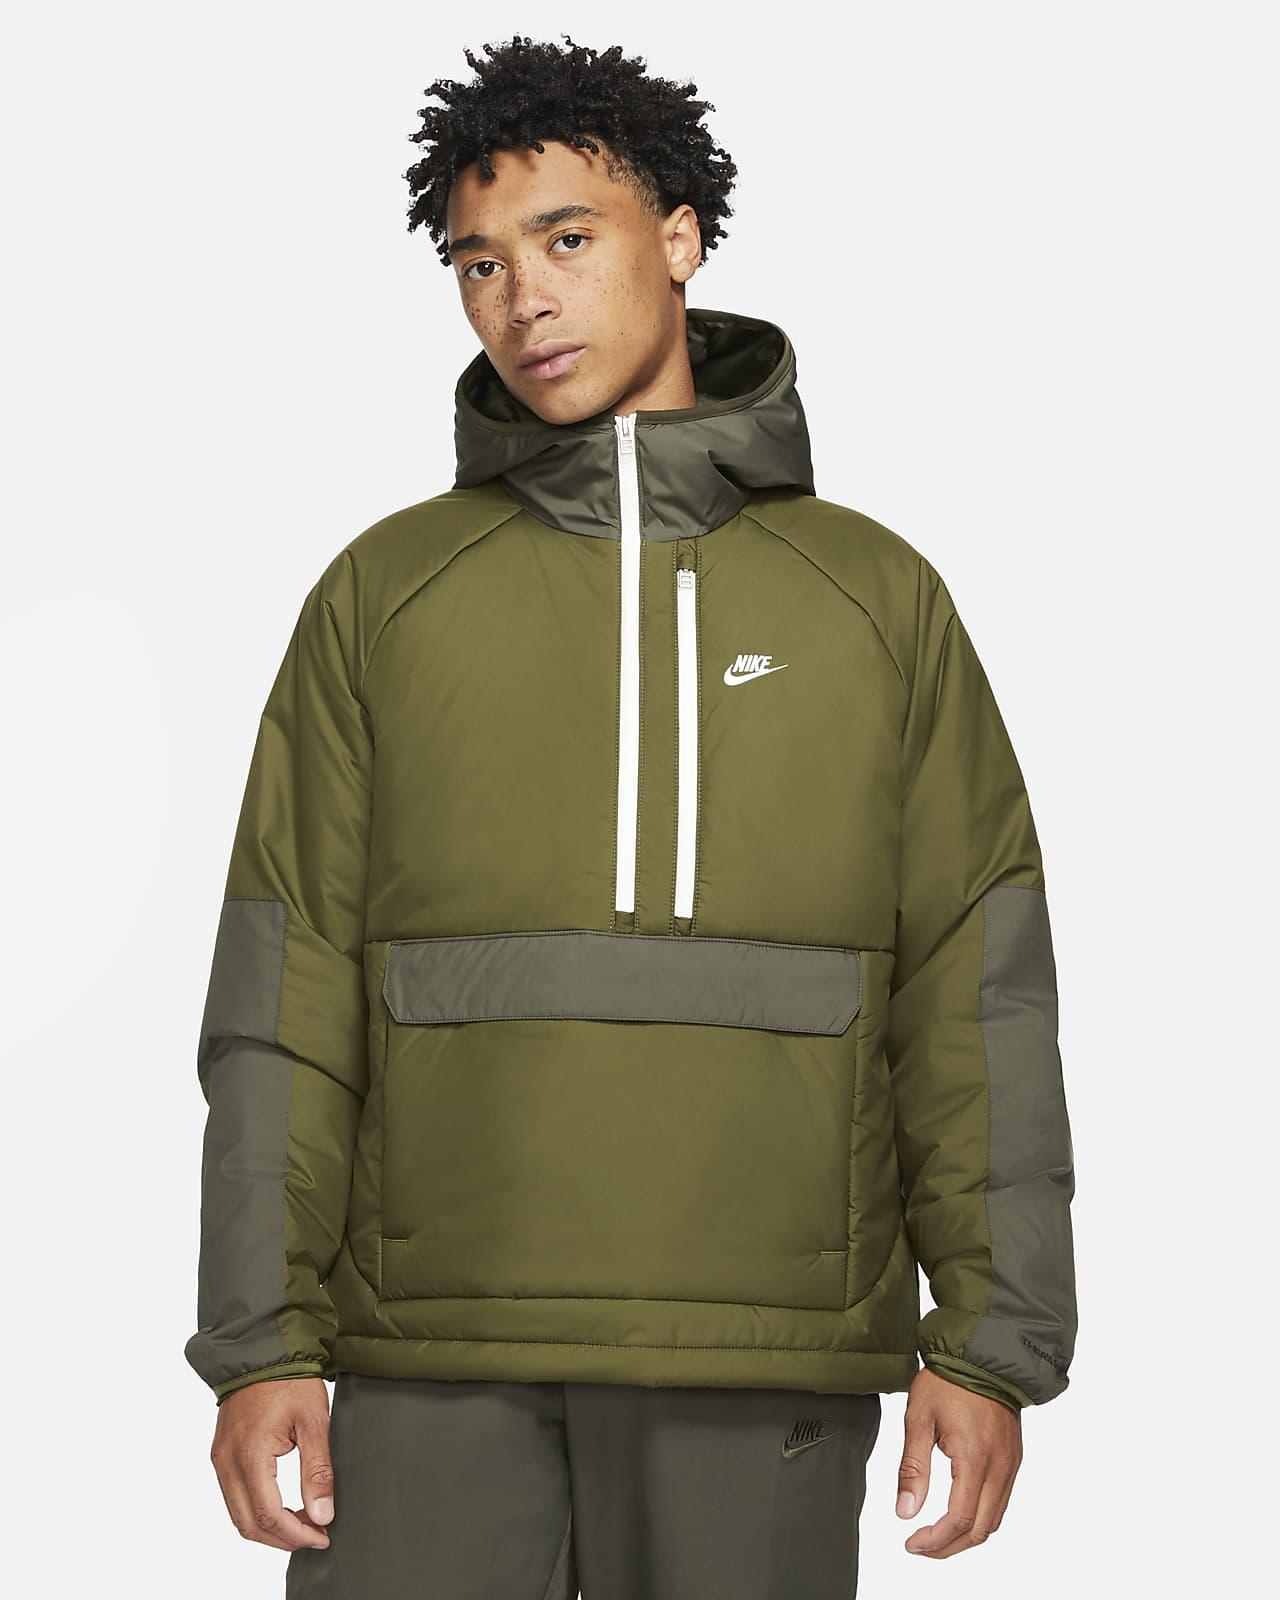 Nike Sportswear Therma-FIT Legacy Men's Hooded Anorak